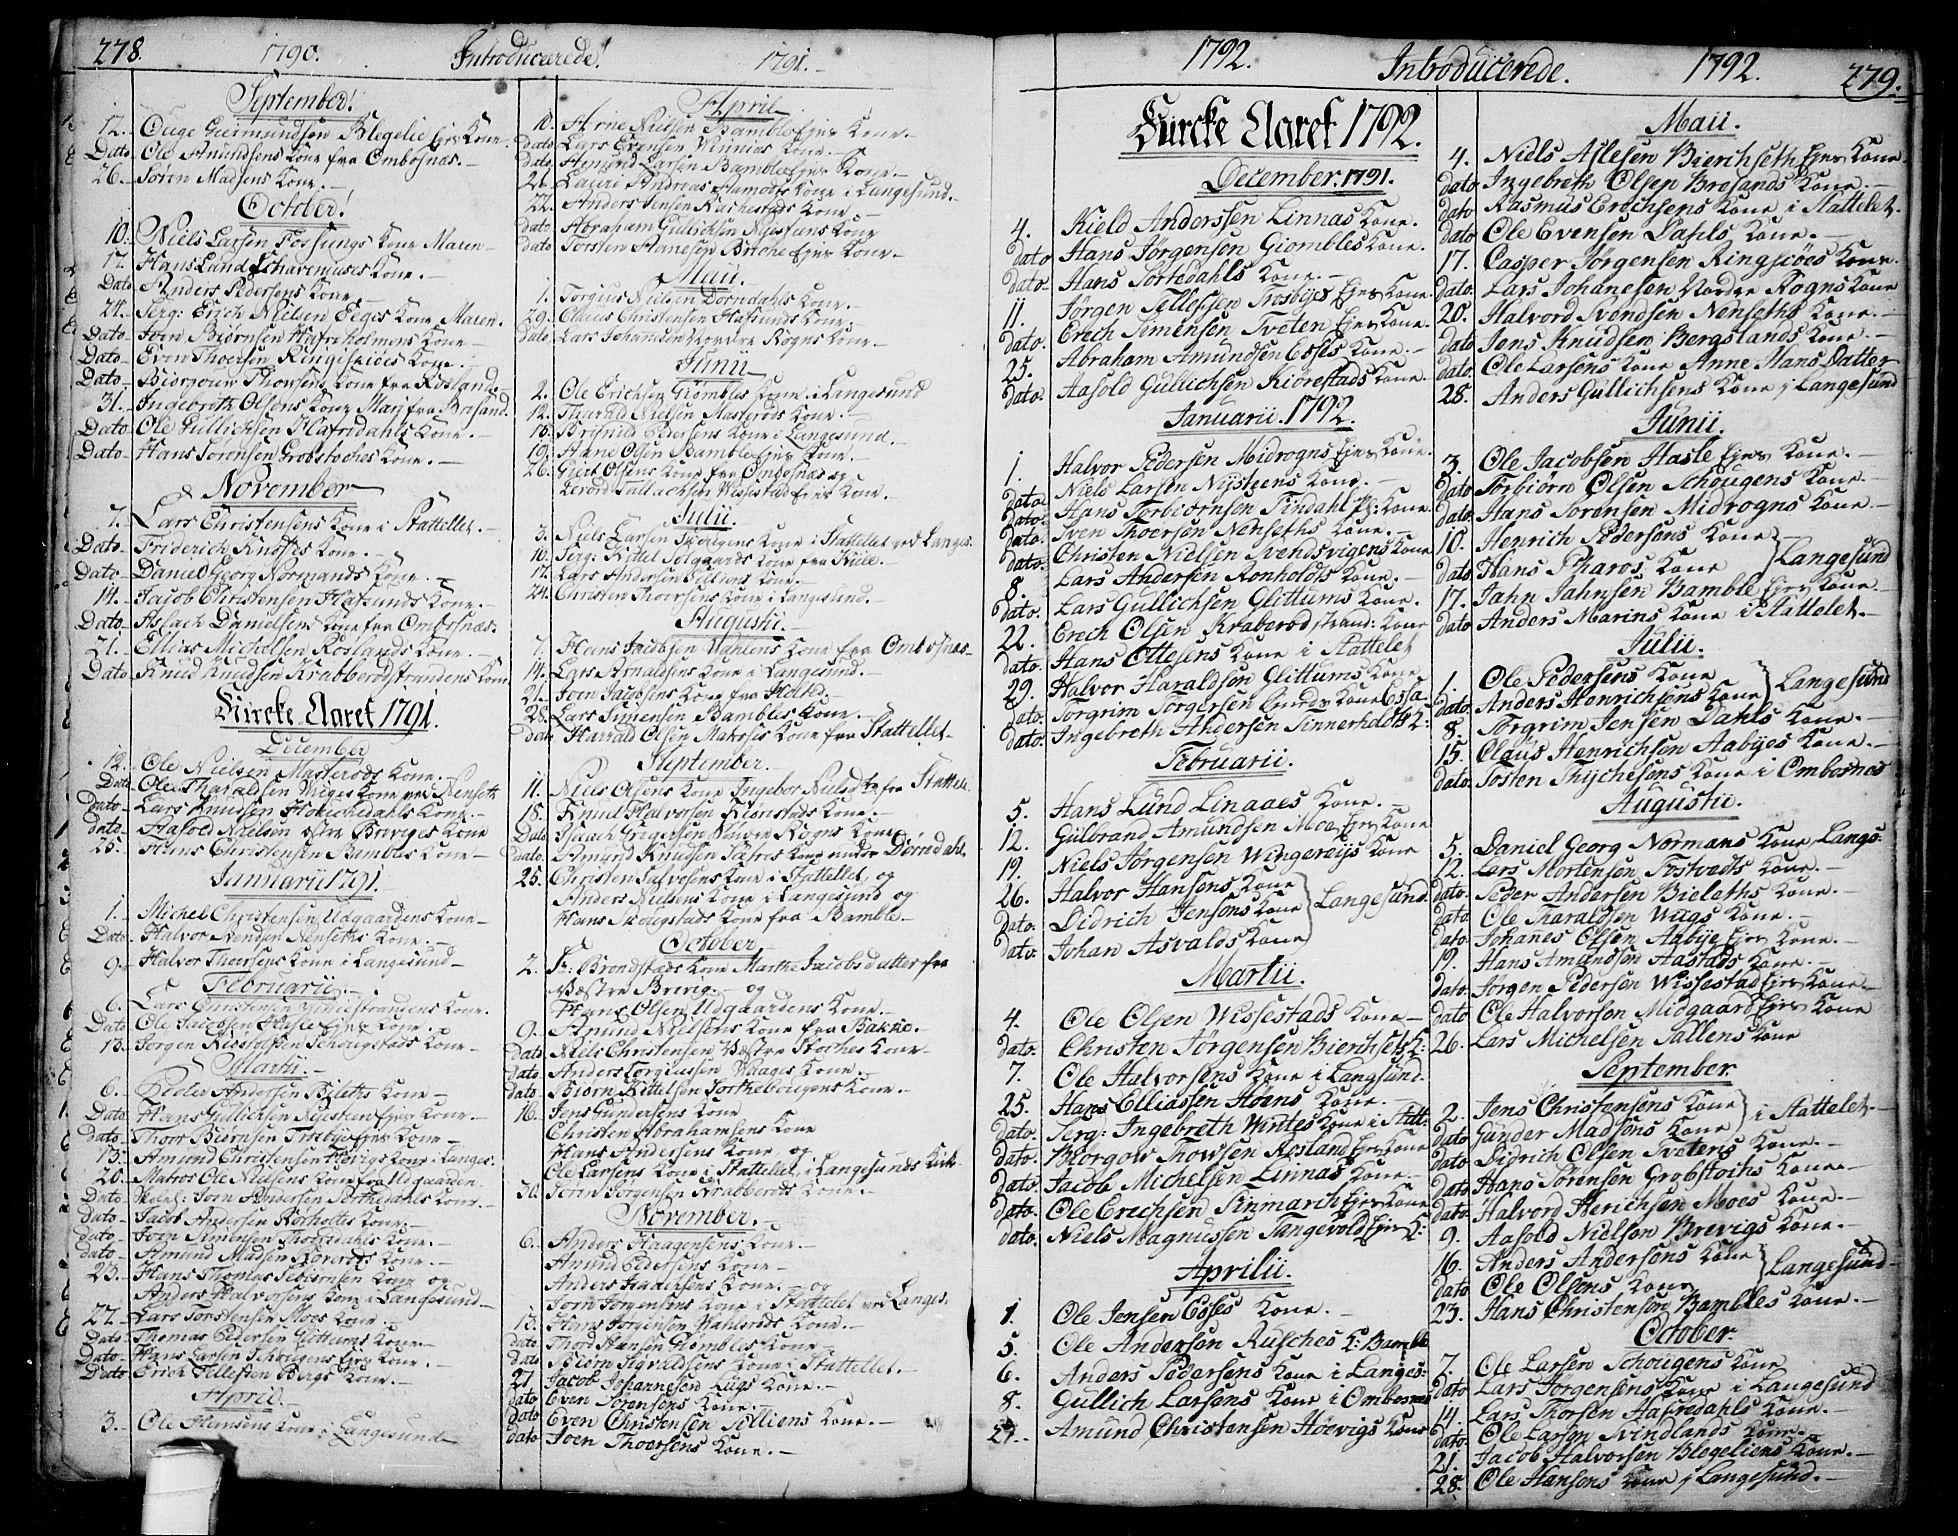 SAKO, Bamble kirkebøker, F/Fa/L0002: Ministerialbok nr. I 2, 1775-1814, s. 278-279